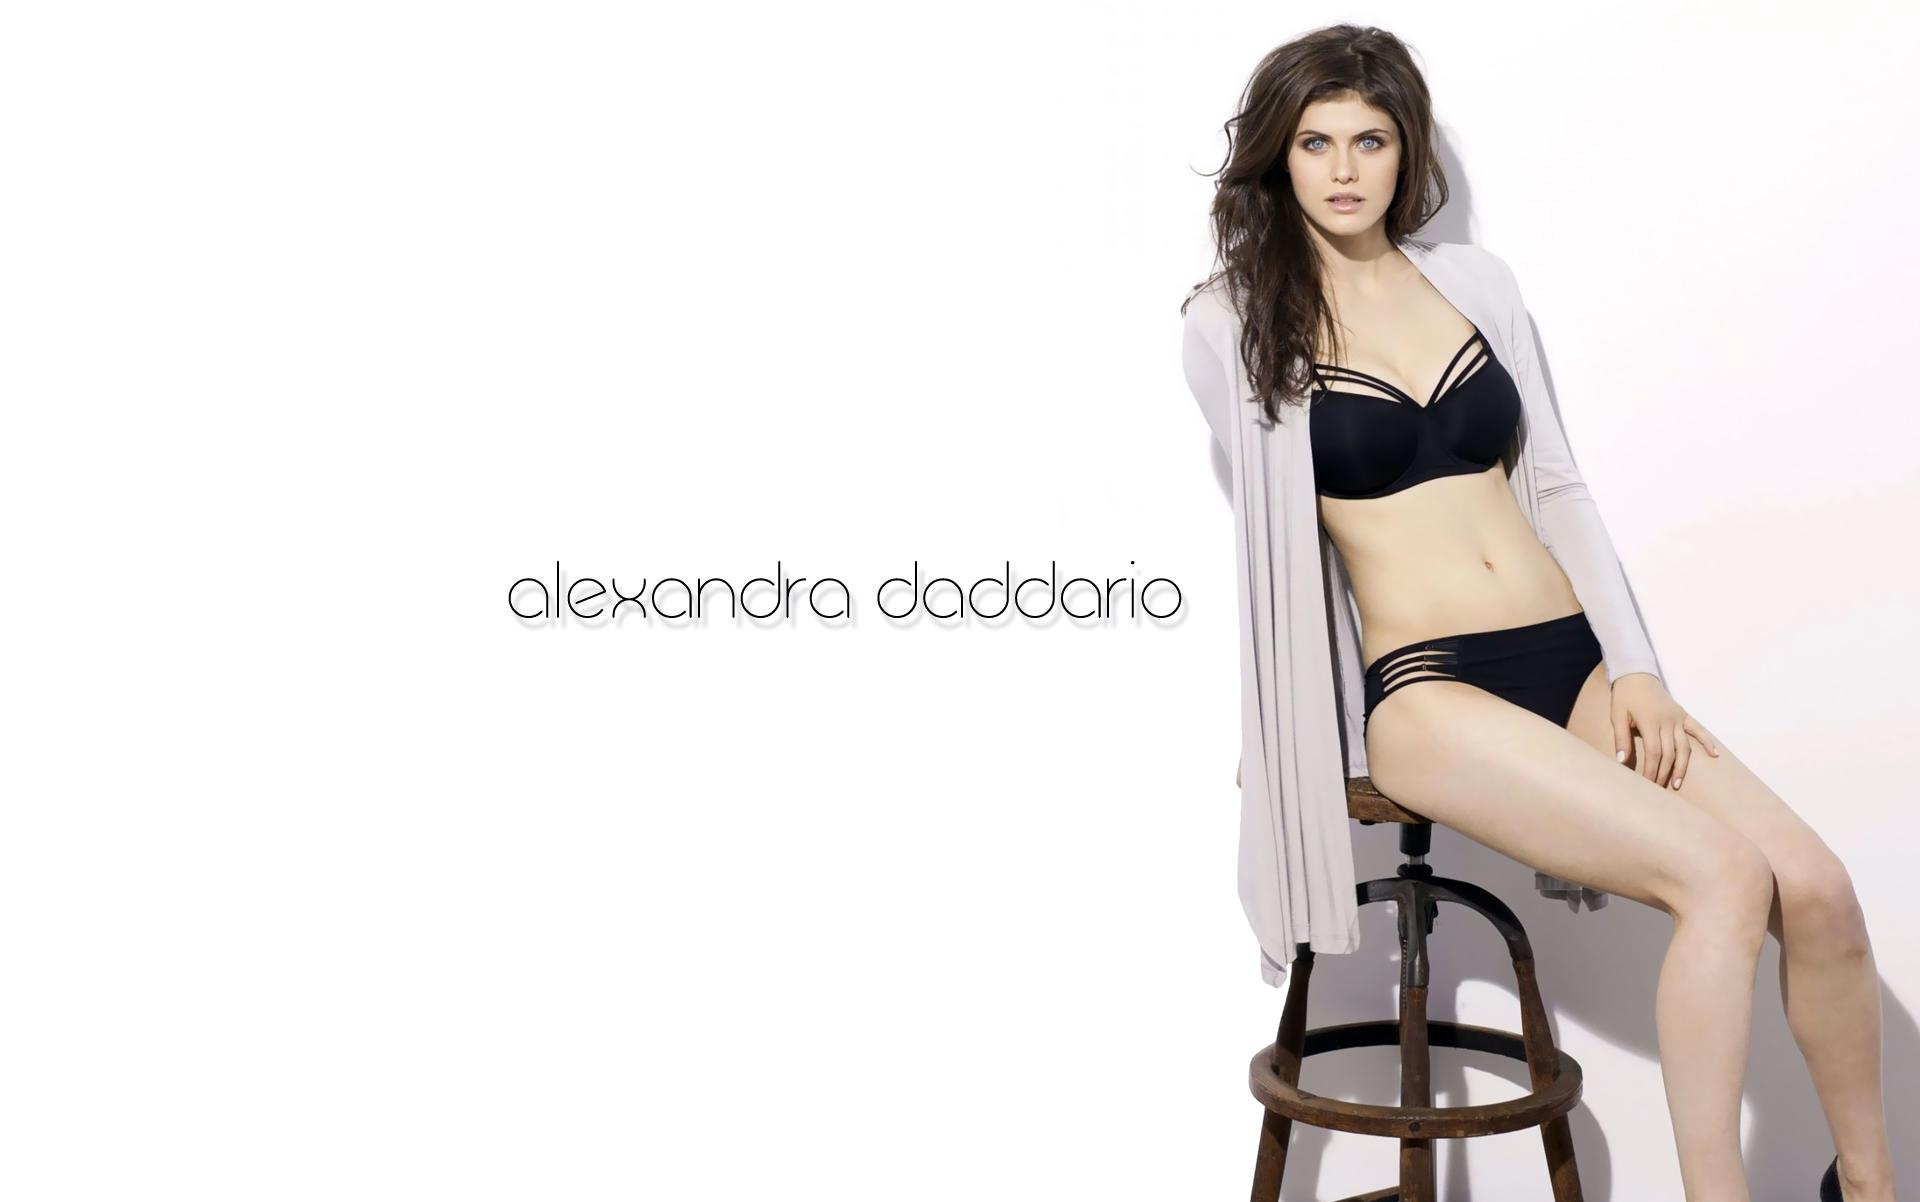 Alexandra Daddario Hot Wallpapers X